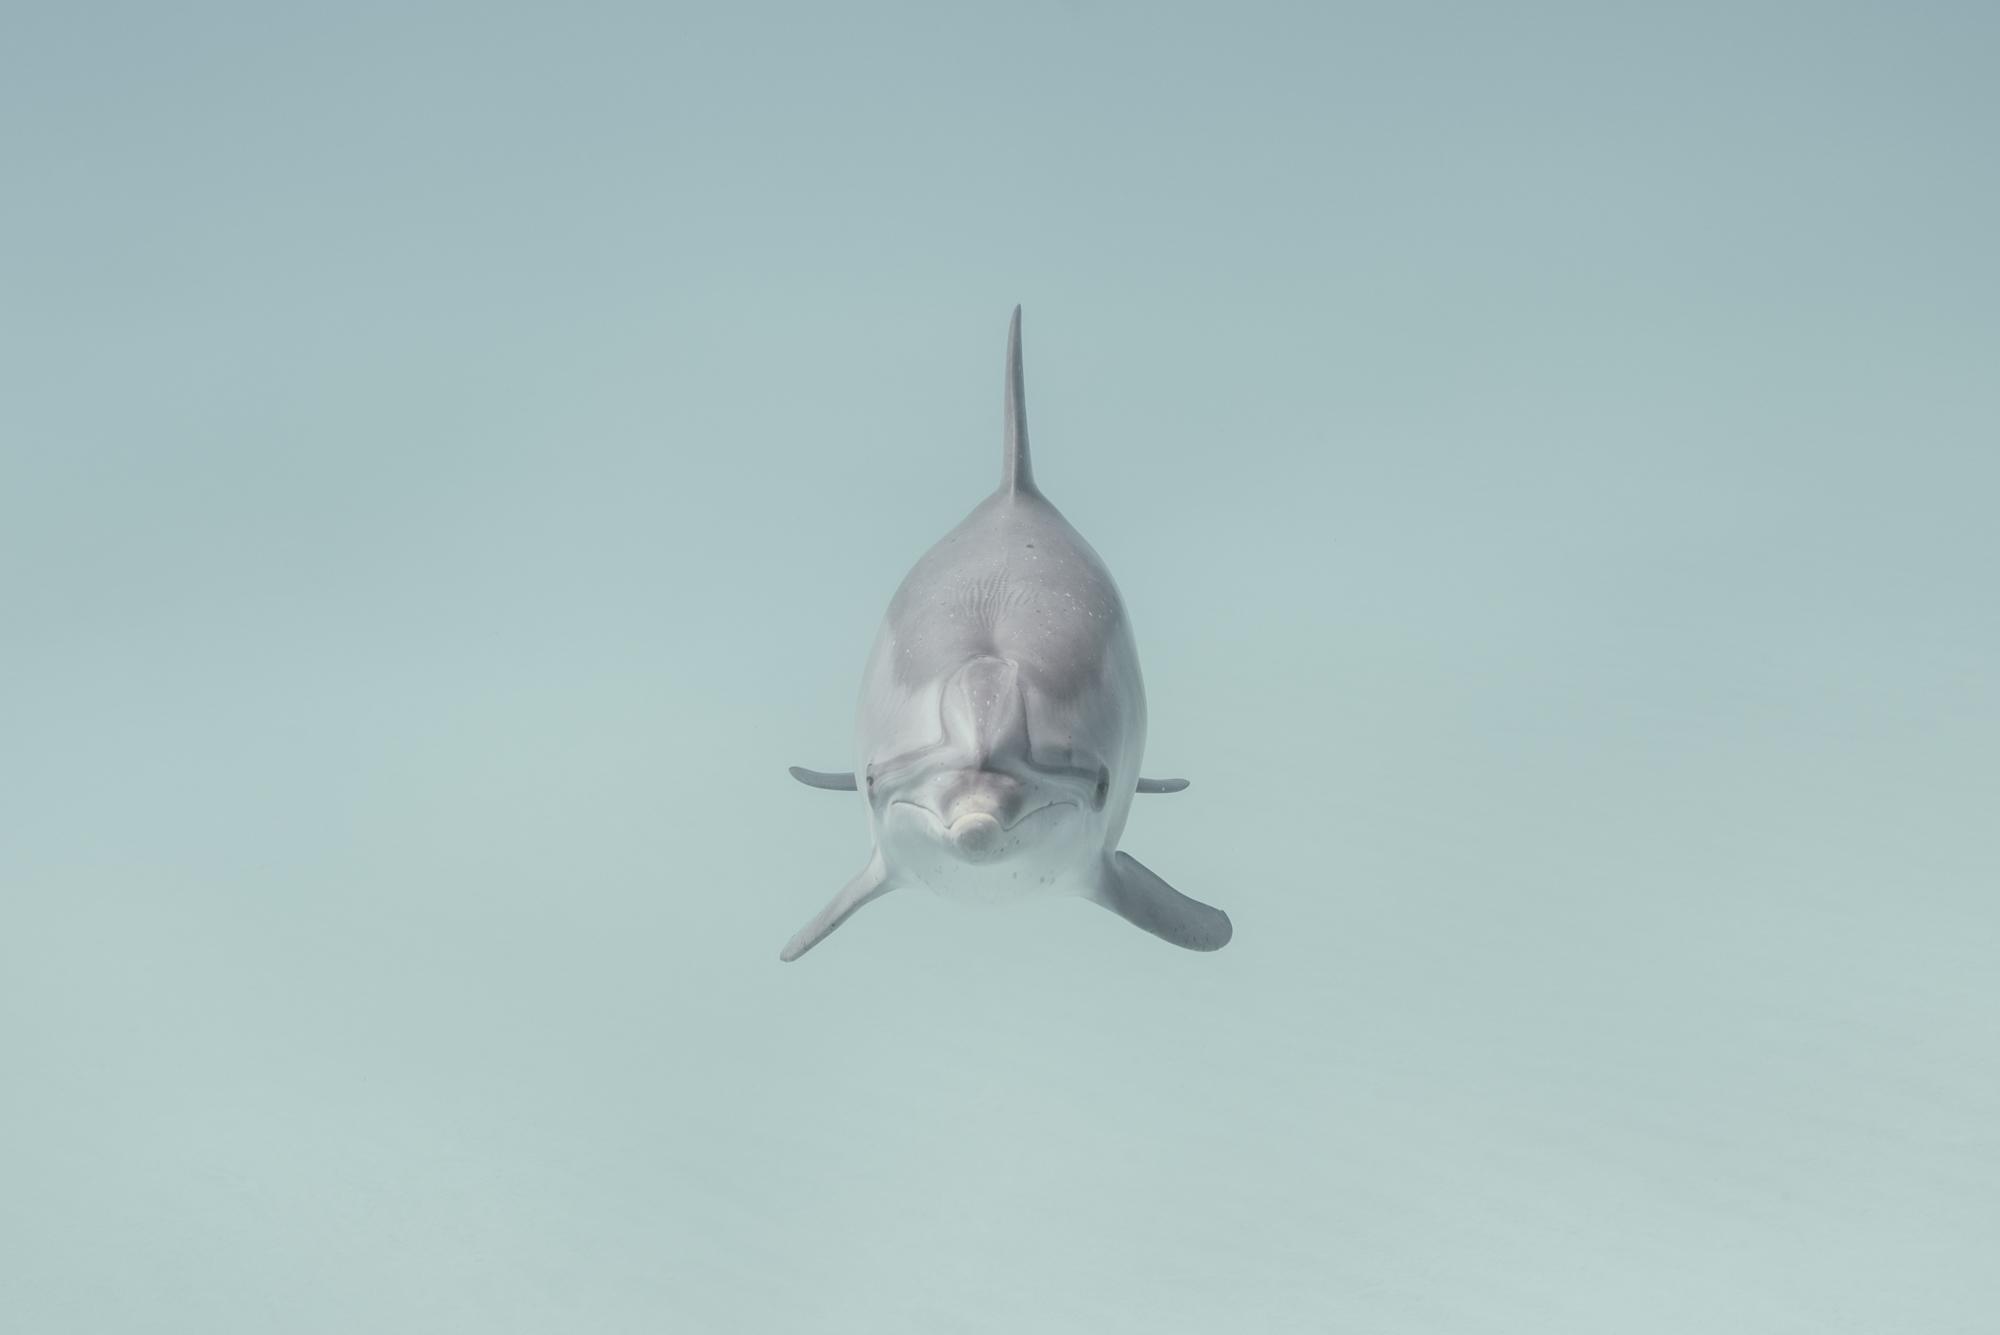 Dolphin charging.jpg